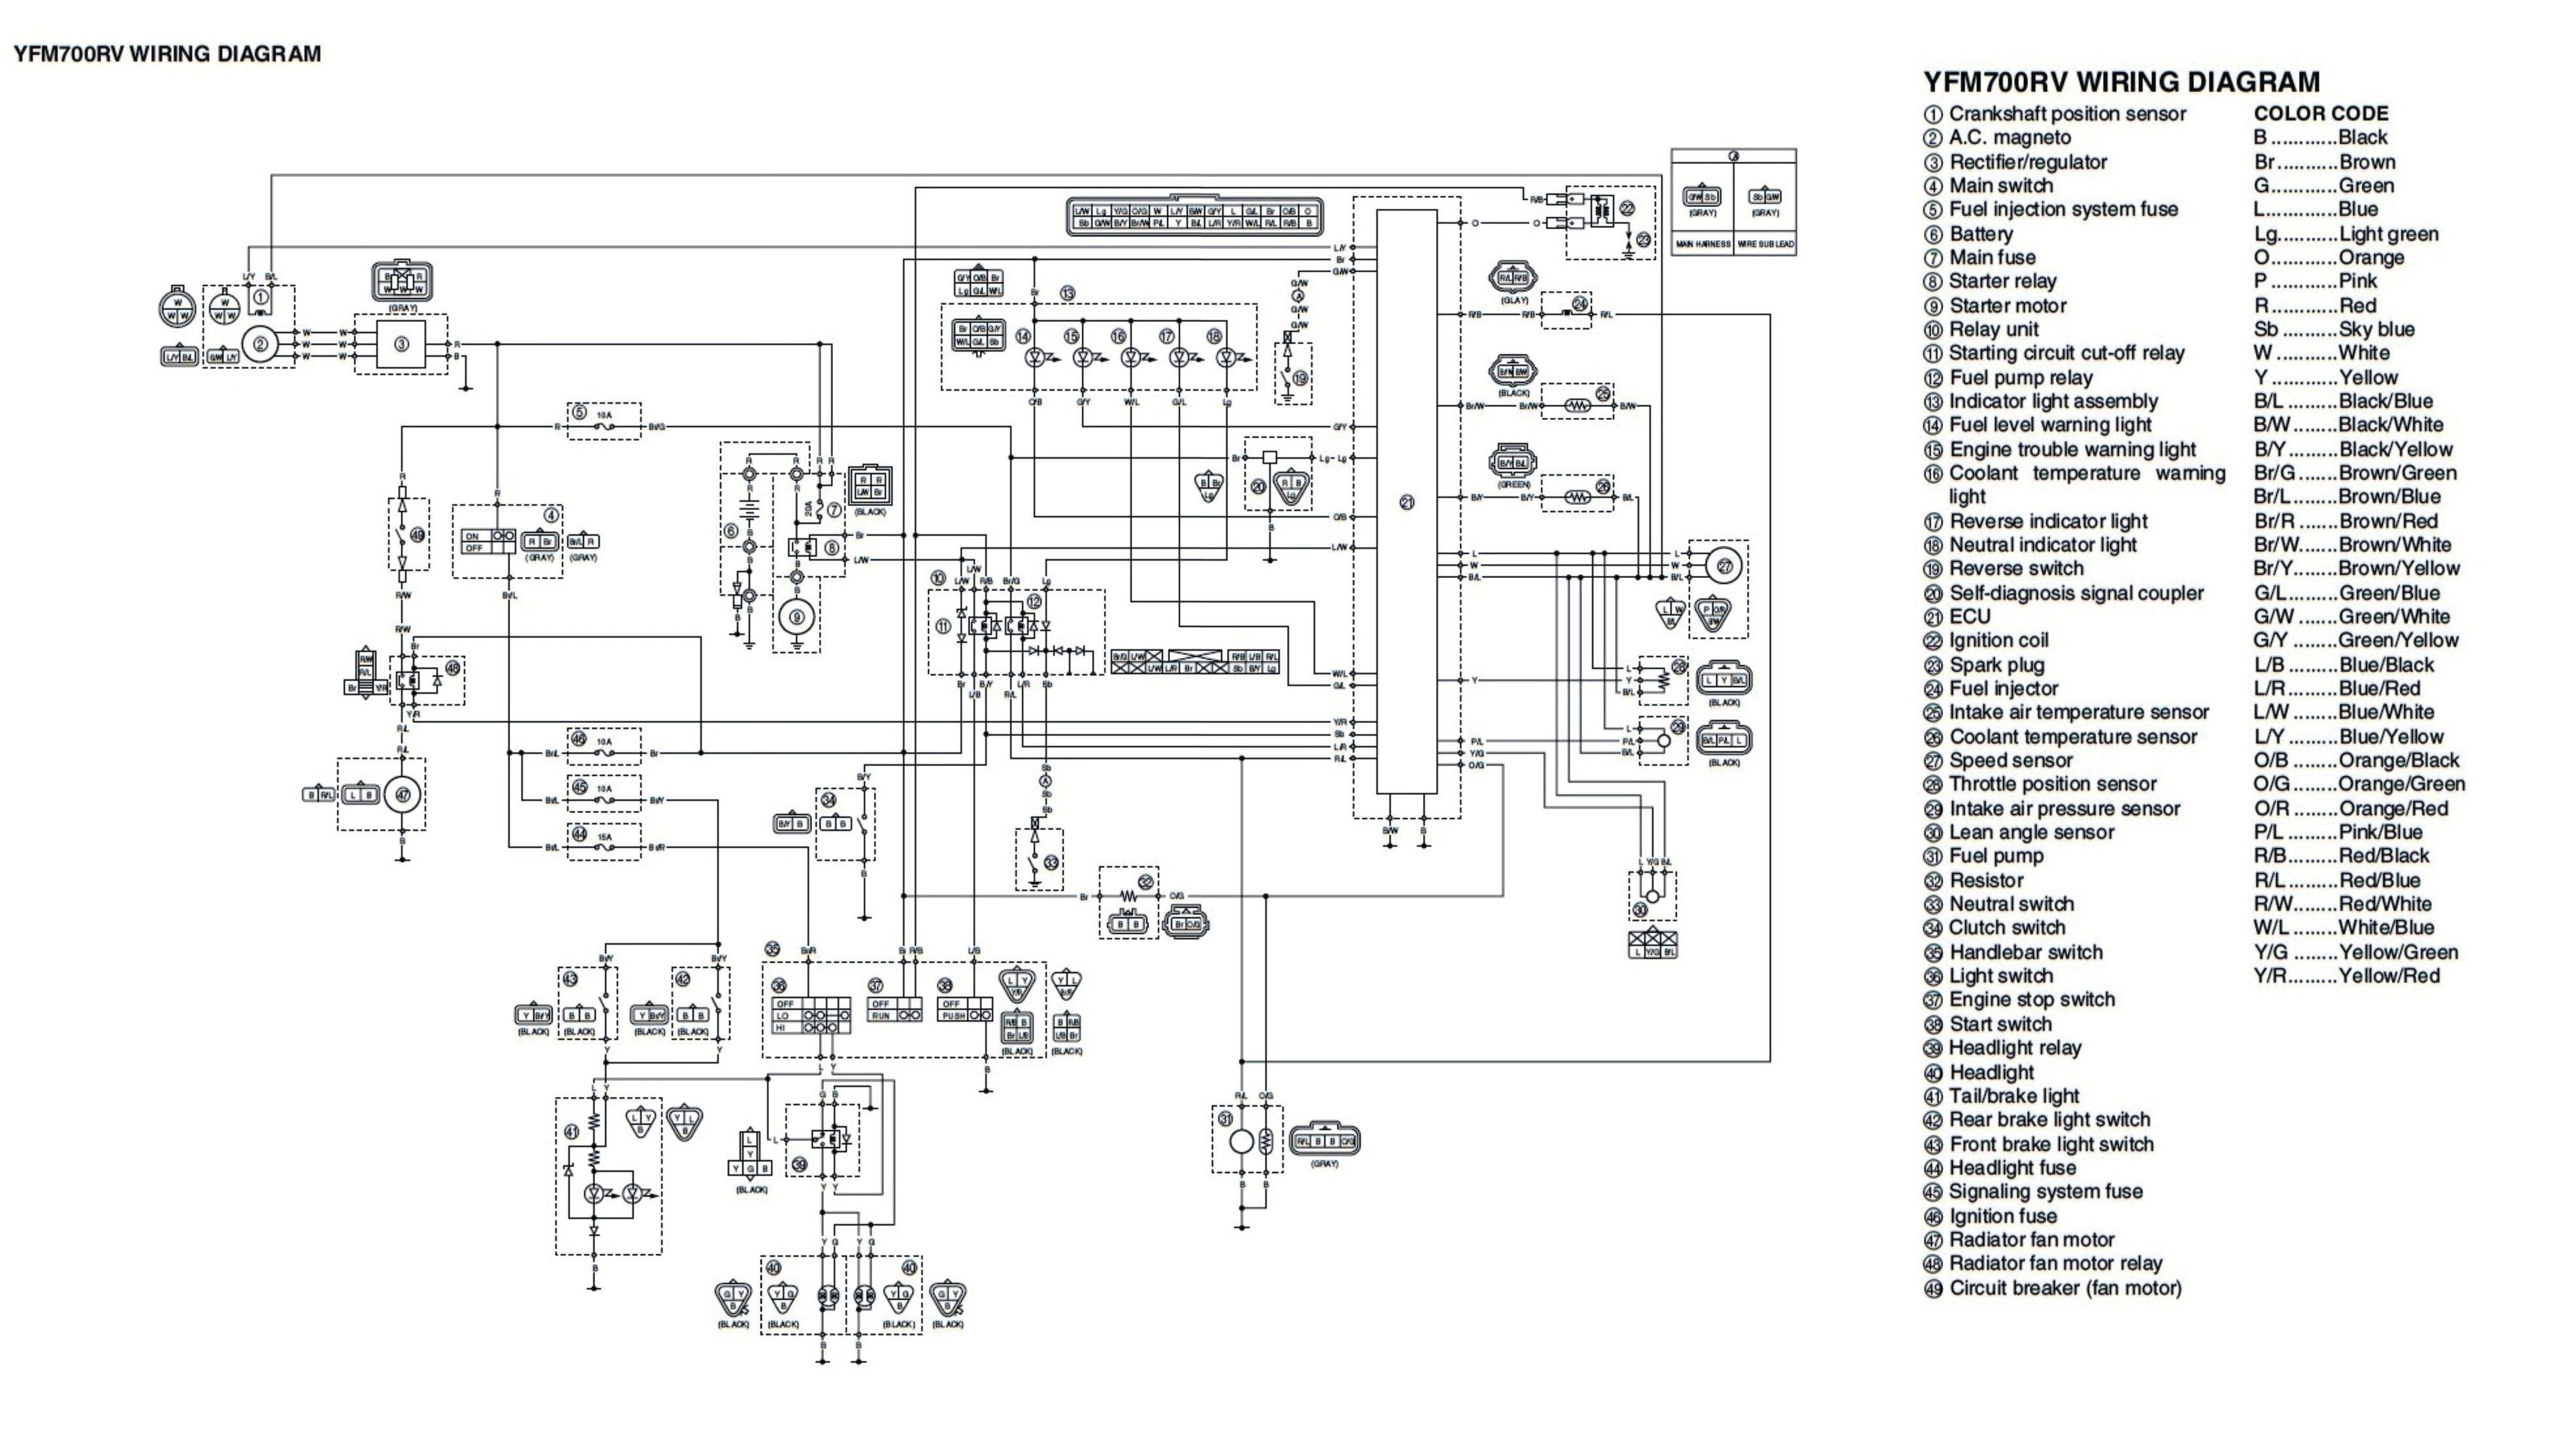 yamaha atv fuse box diagram wiring diagram long yamaha r1 fuse box diagram atv fuse box